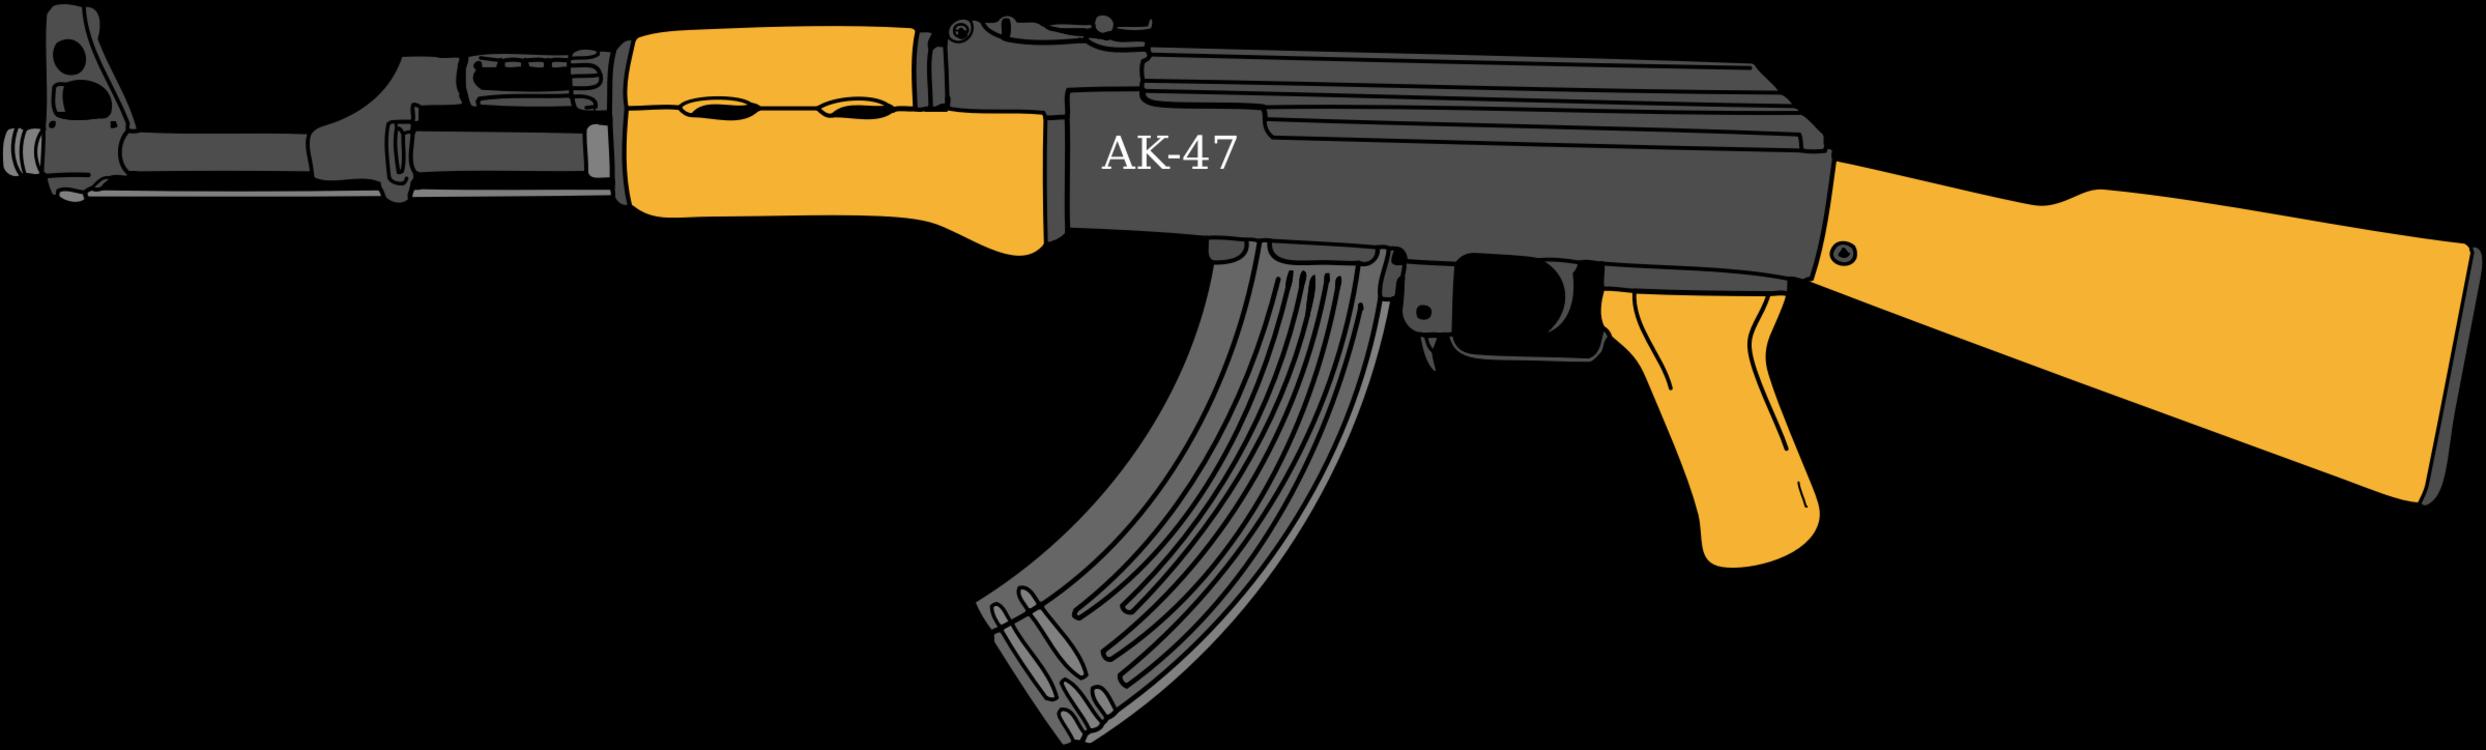 Gun Accessory,Machine Gun,Ammunition